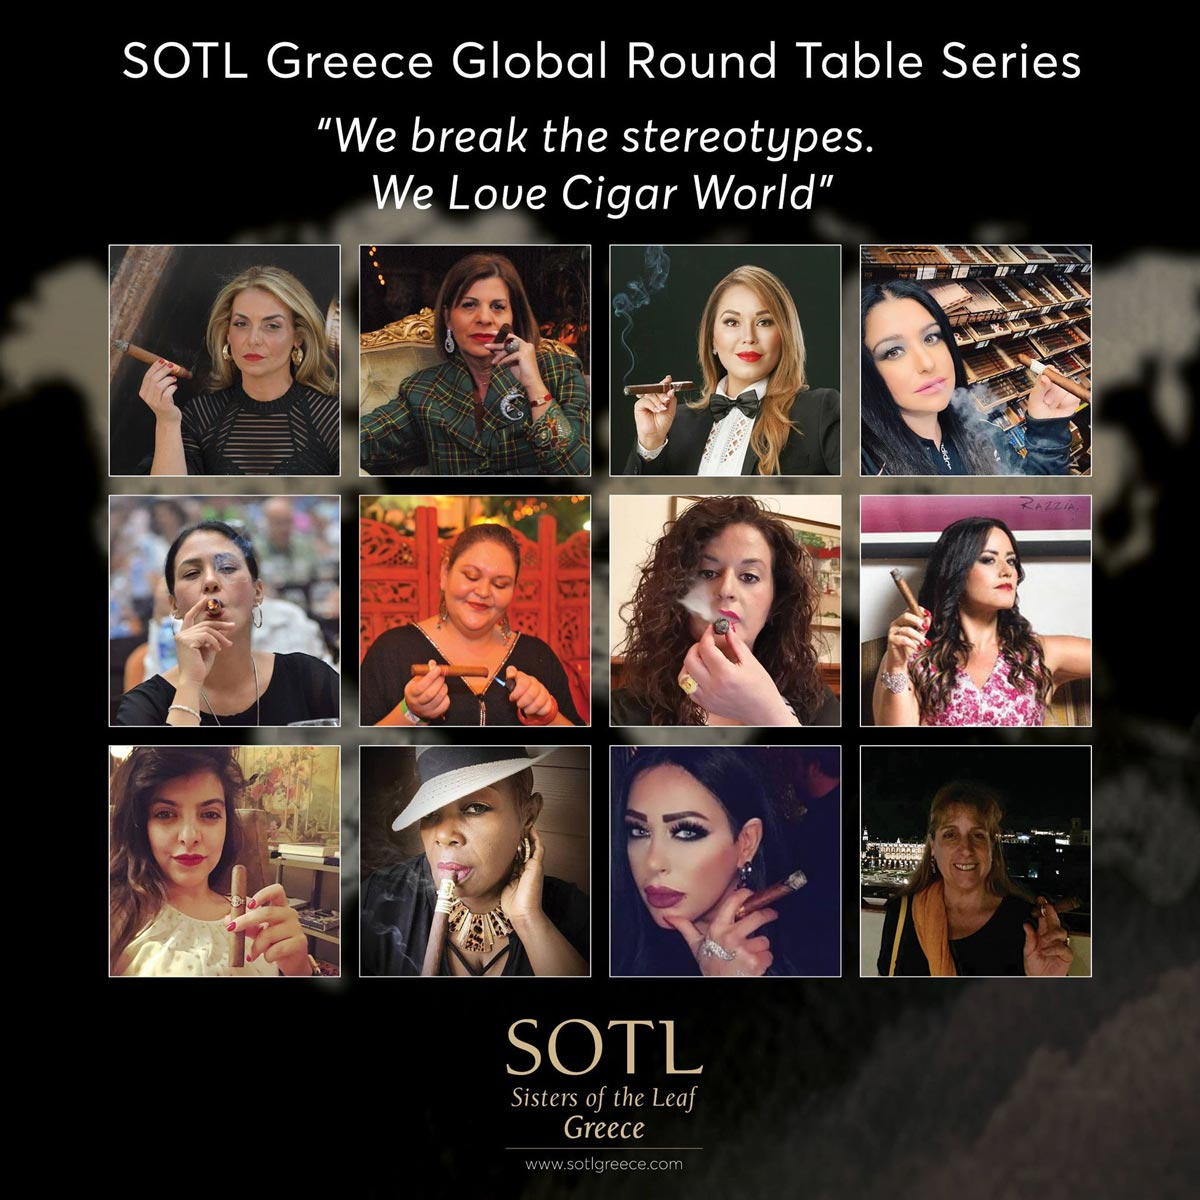 We break the stereotypes. We love cigar world - SOTL Greece